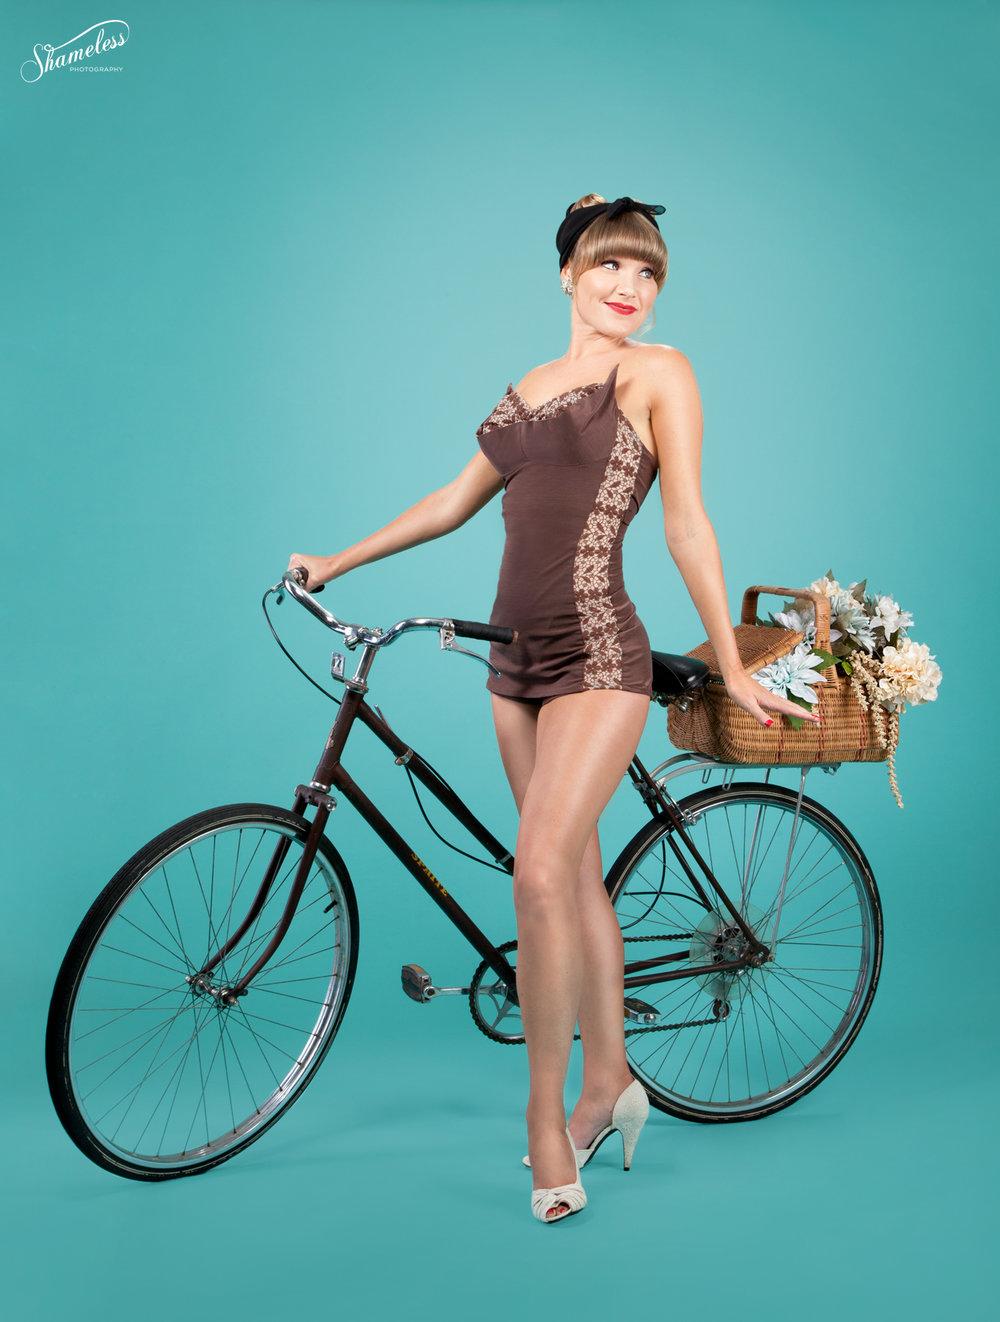 Carrie-WebReady-CareyLynne-06.jpg